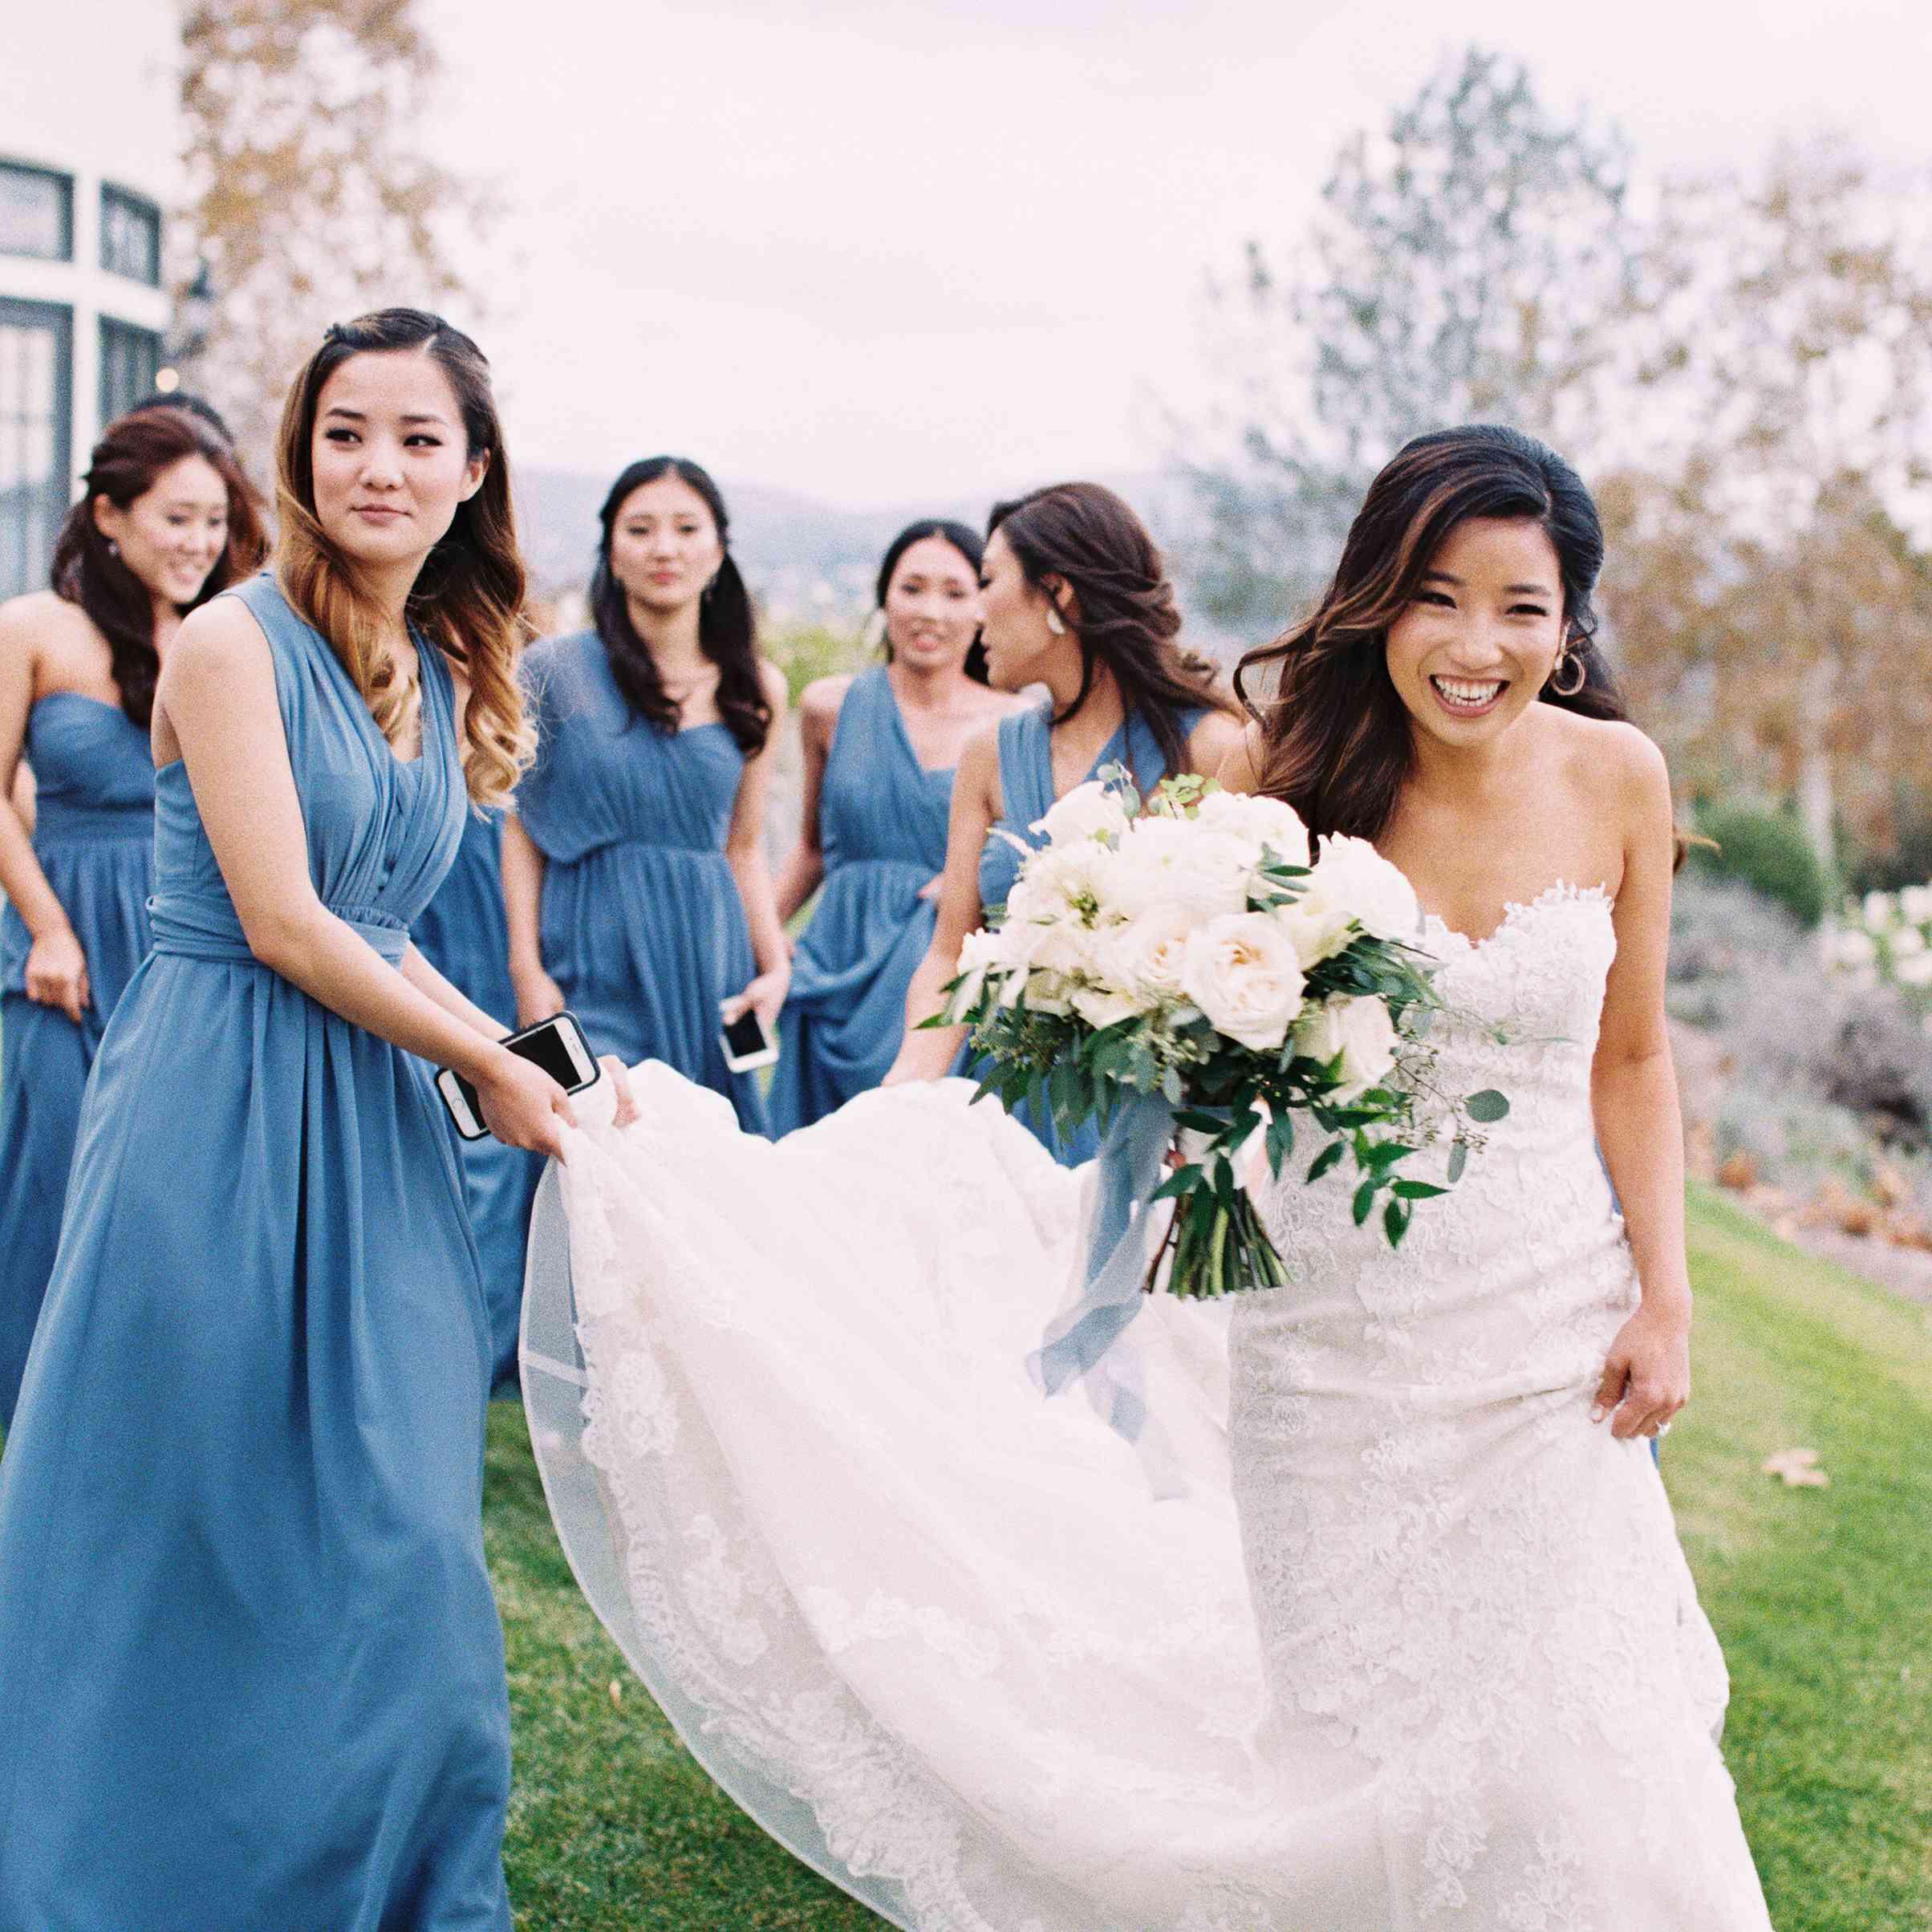 Bridesmaids holding train